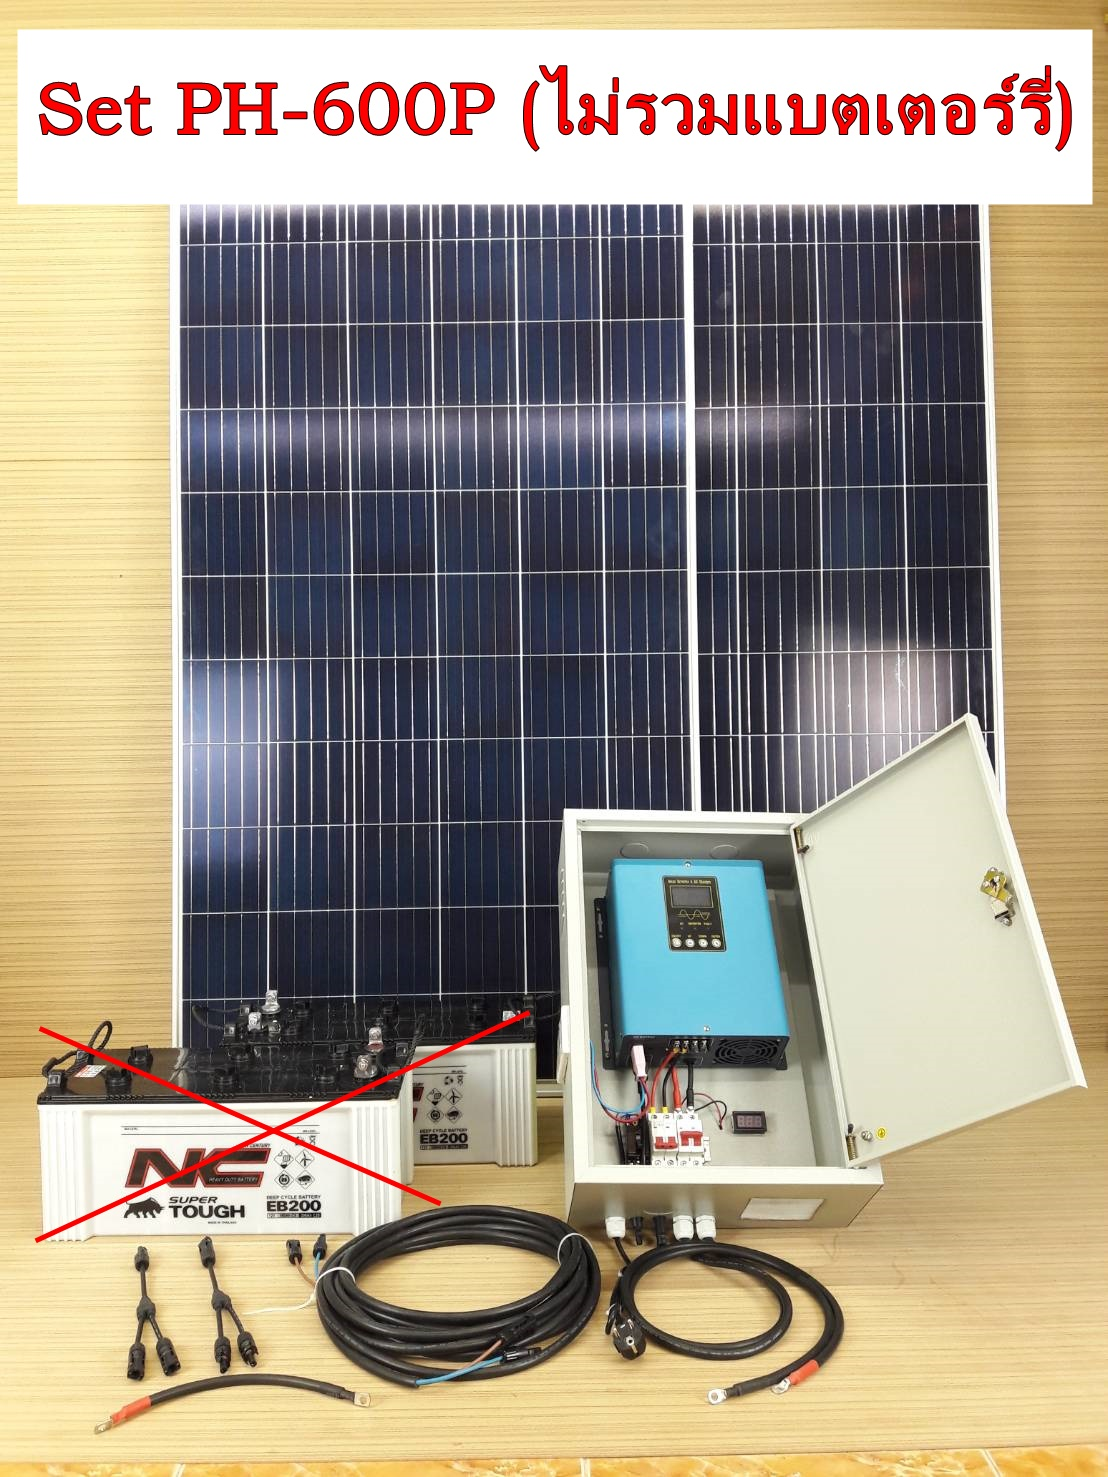 Solar Smart Energy (ไม่รวมแบตเตอร์รี่)